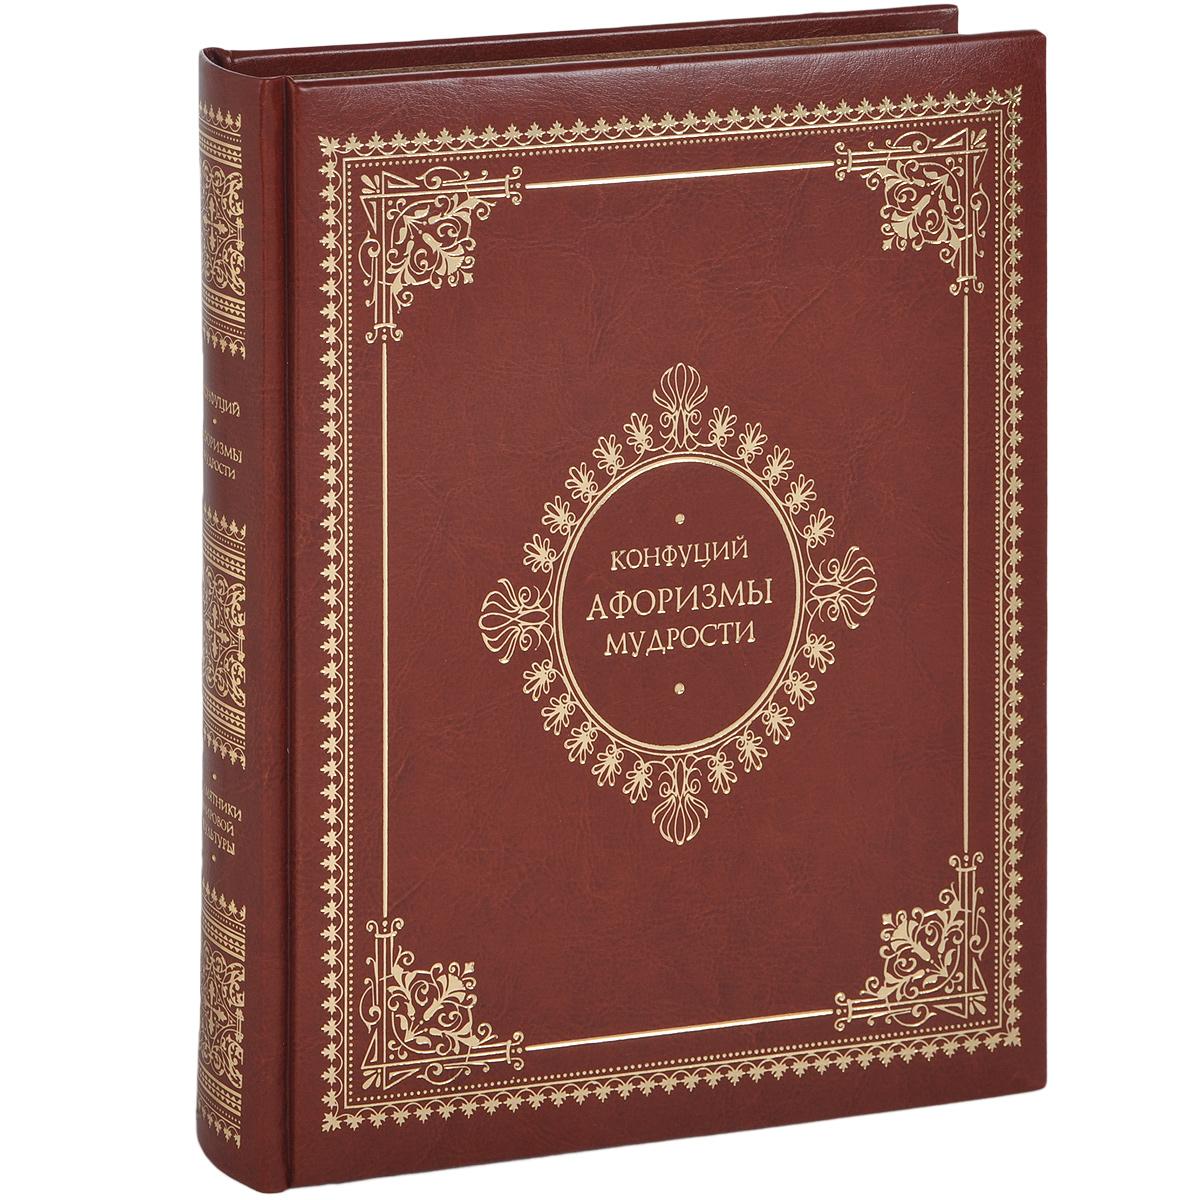 Конфуций Афоризмы мудрости lowell настенные часы lowell 11130 коллекция часы картины